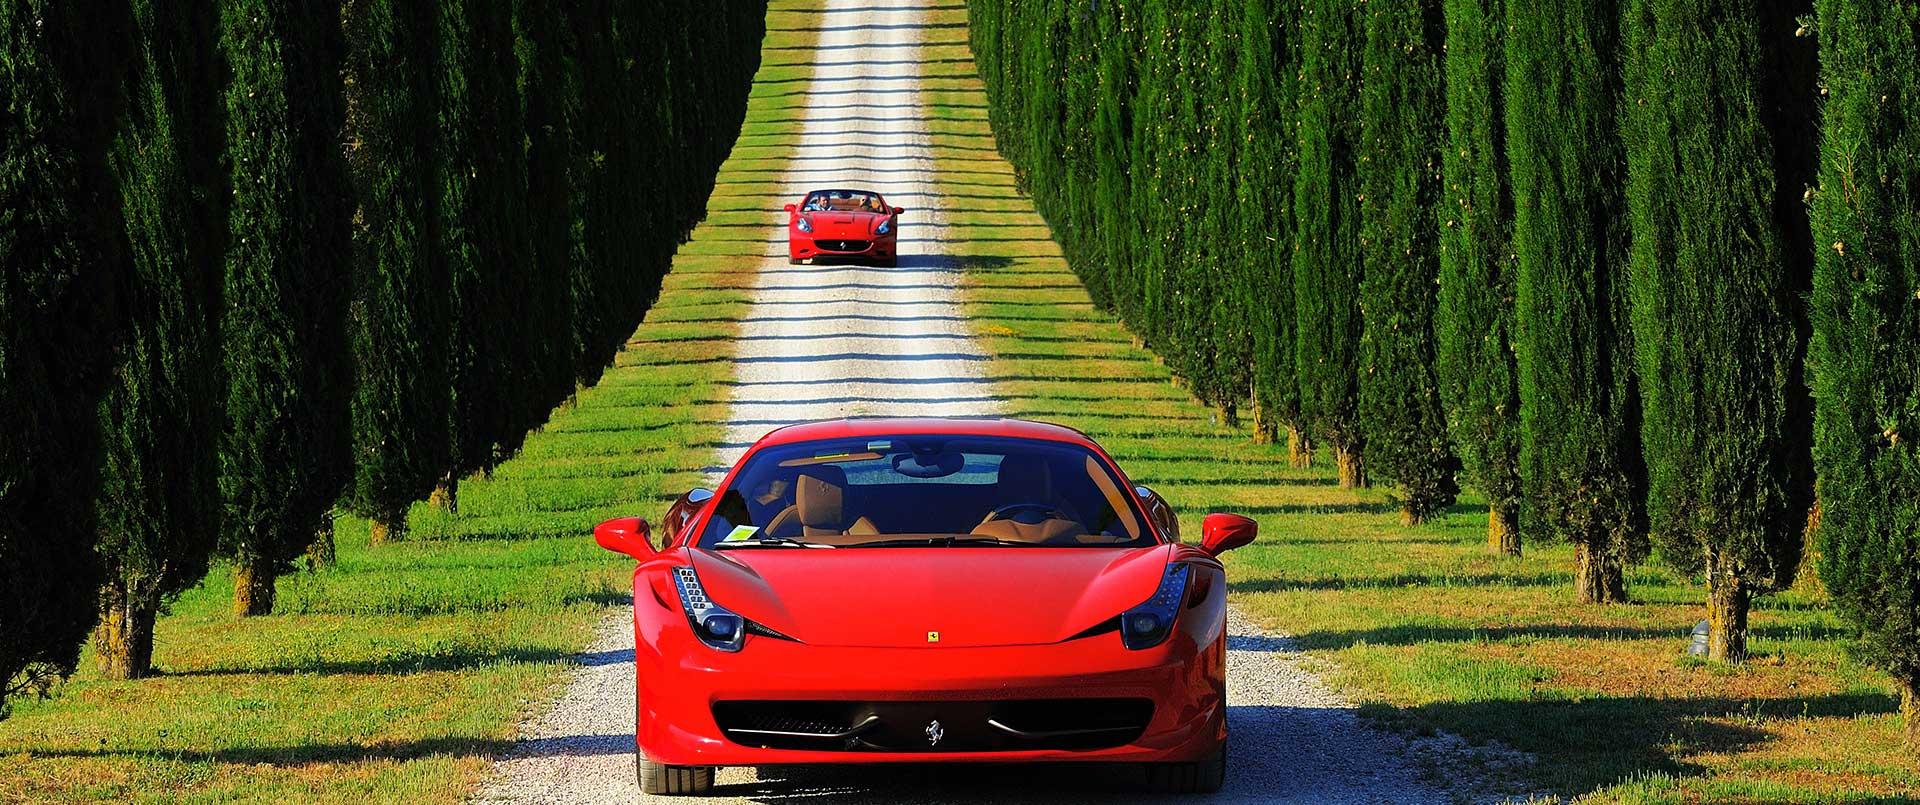 Ferrari Self-Drive in Italy